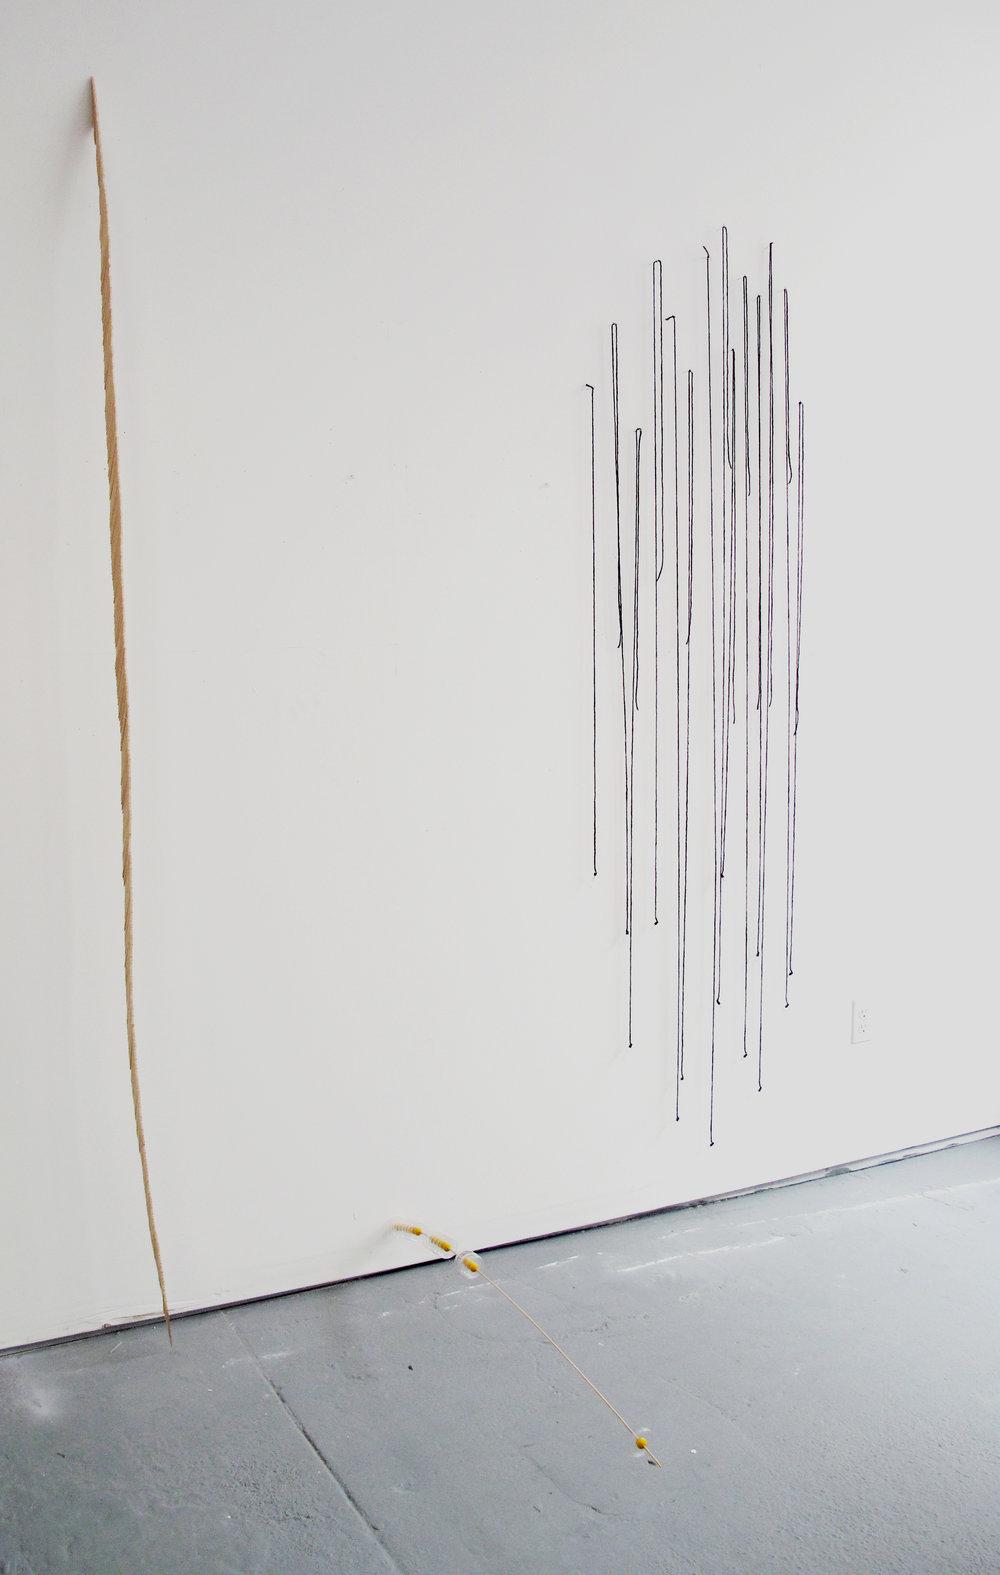 "Sliver  : Craft Picks - 92"" x 1/2"" x 4 1/2""   Gravitational Arch  : Dowel, Plastic Lids, Painted Wood Beads - 3"" x 2"" x 42""   Linear Points  : Yarn, Pins, Q-Tip Ends - 84"" x 23"" x 1"""